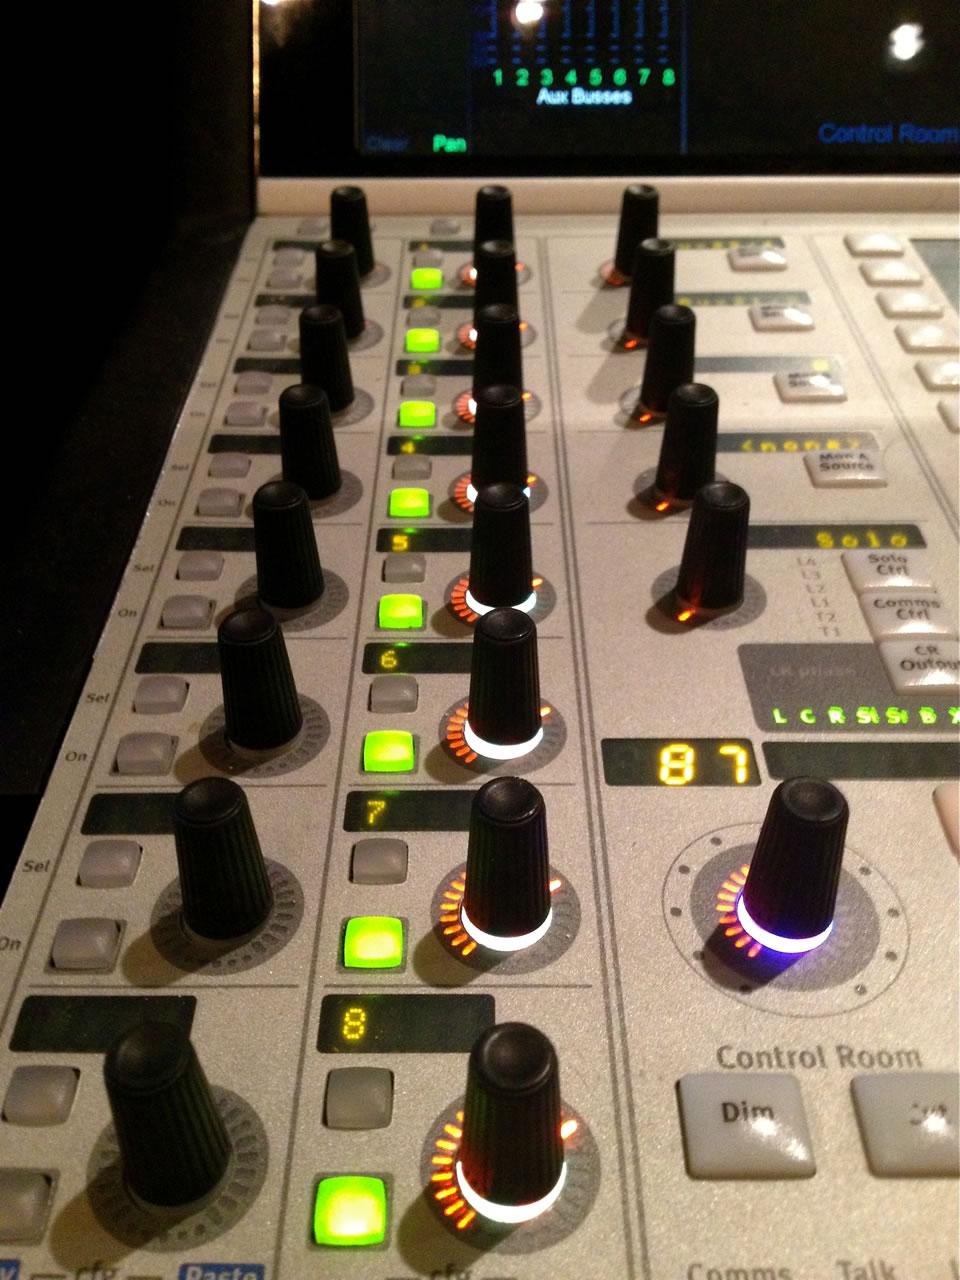 Remote Control Studio: Euphonix System 5